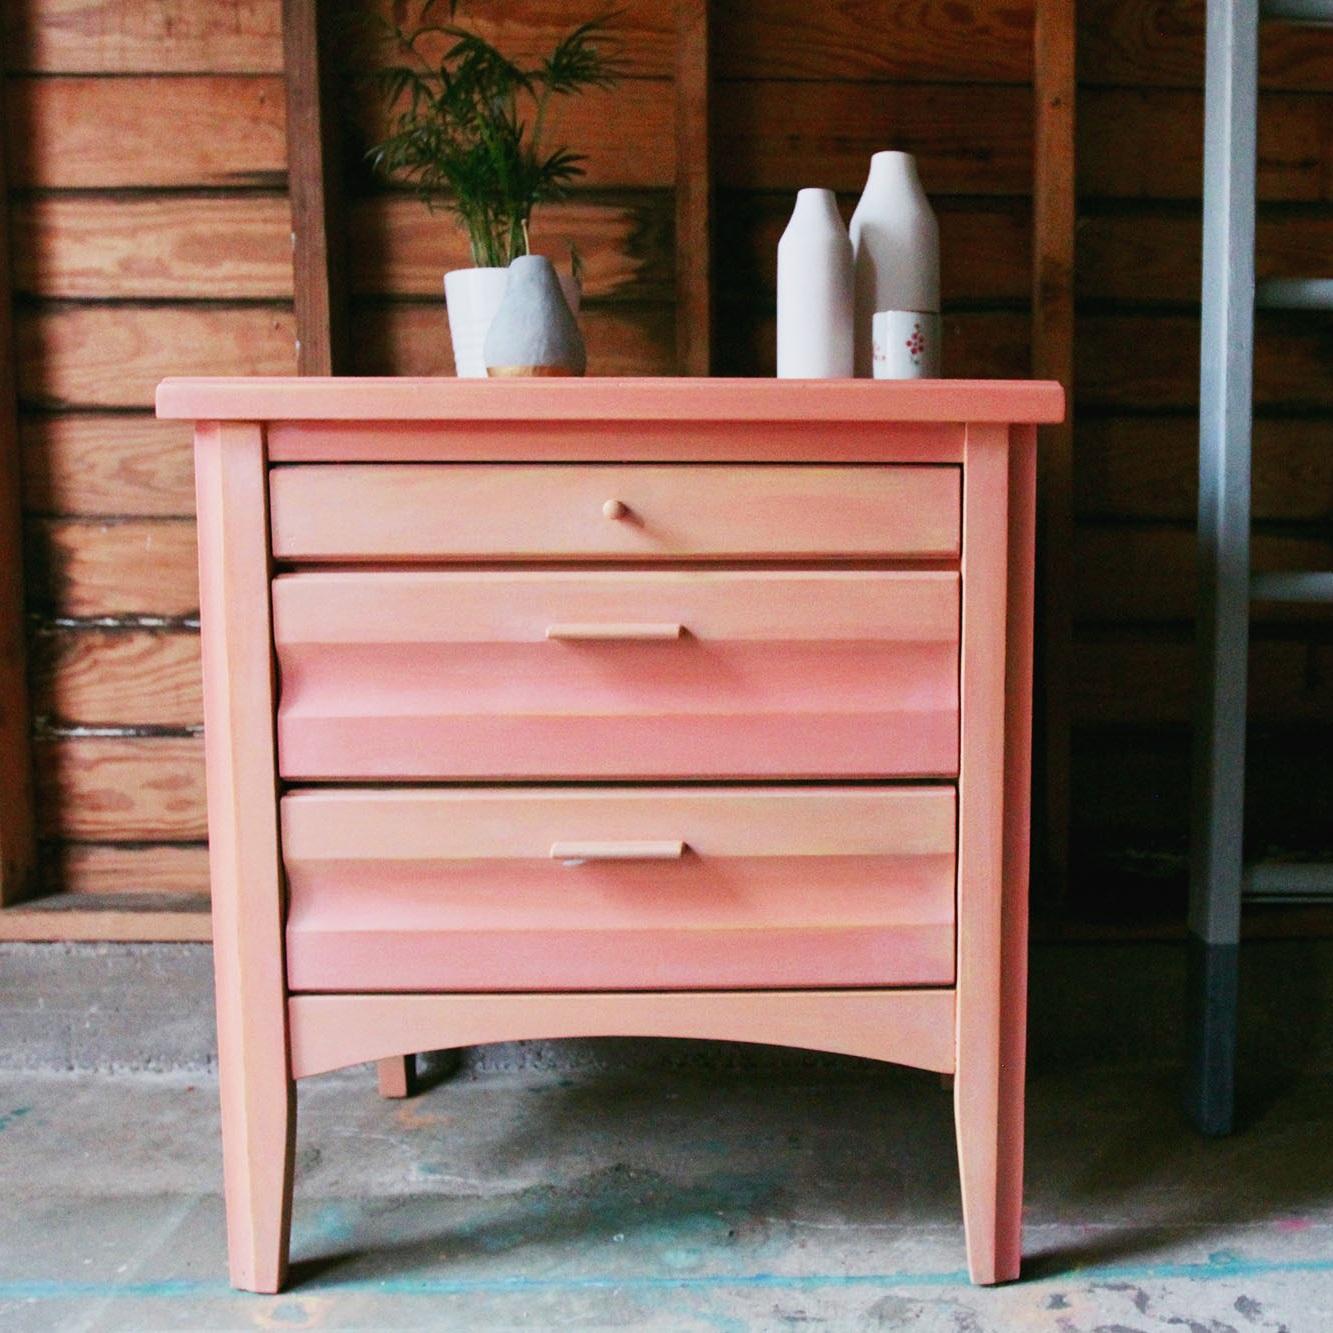 a-simpler-design-annie-sloan-sunset-ombre-dresser-coral-pinkjpg11.jpg